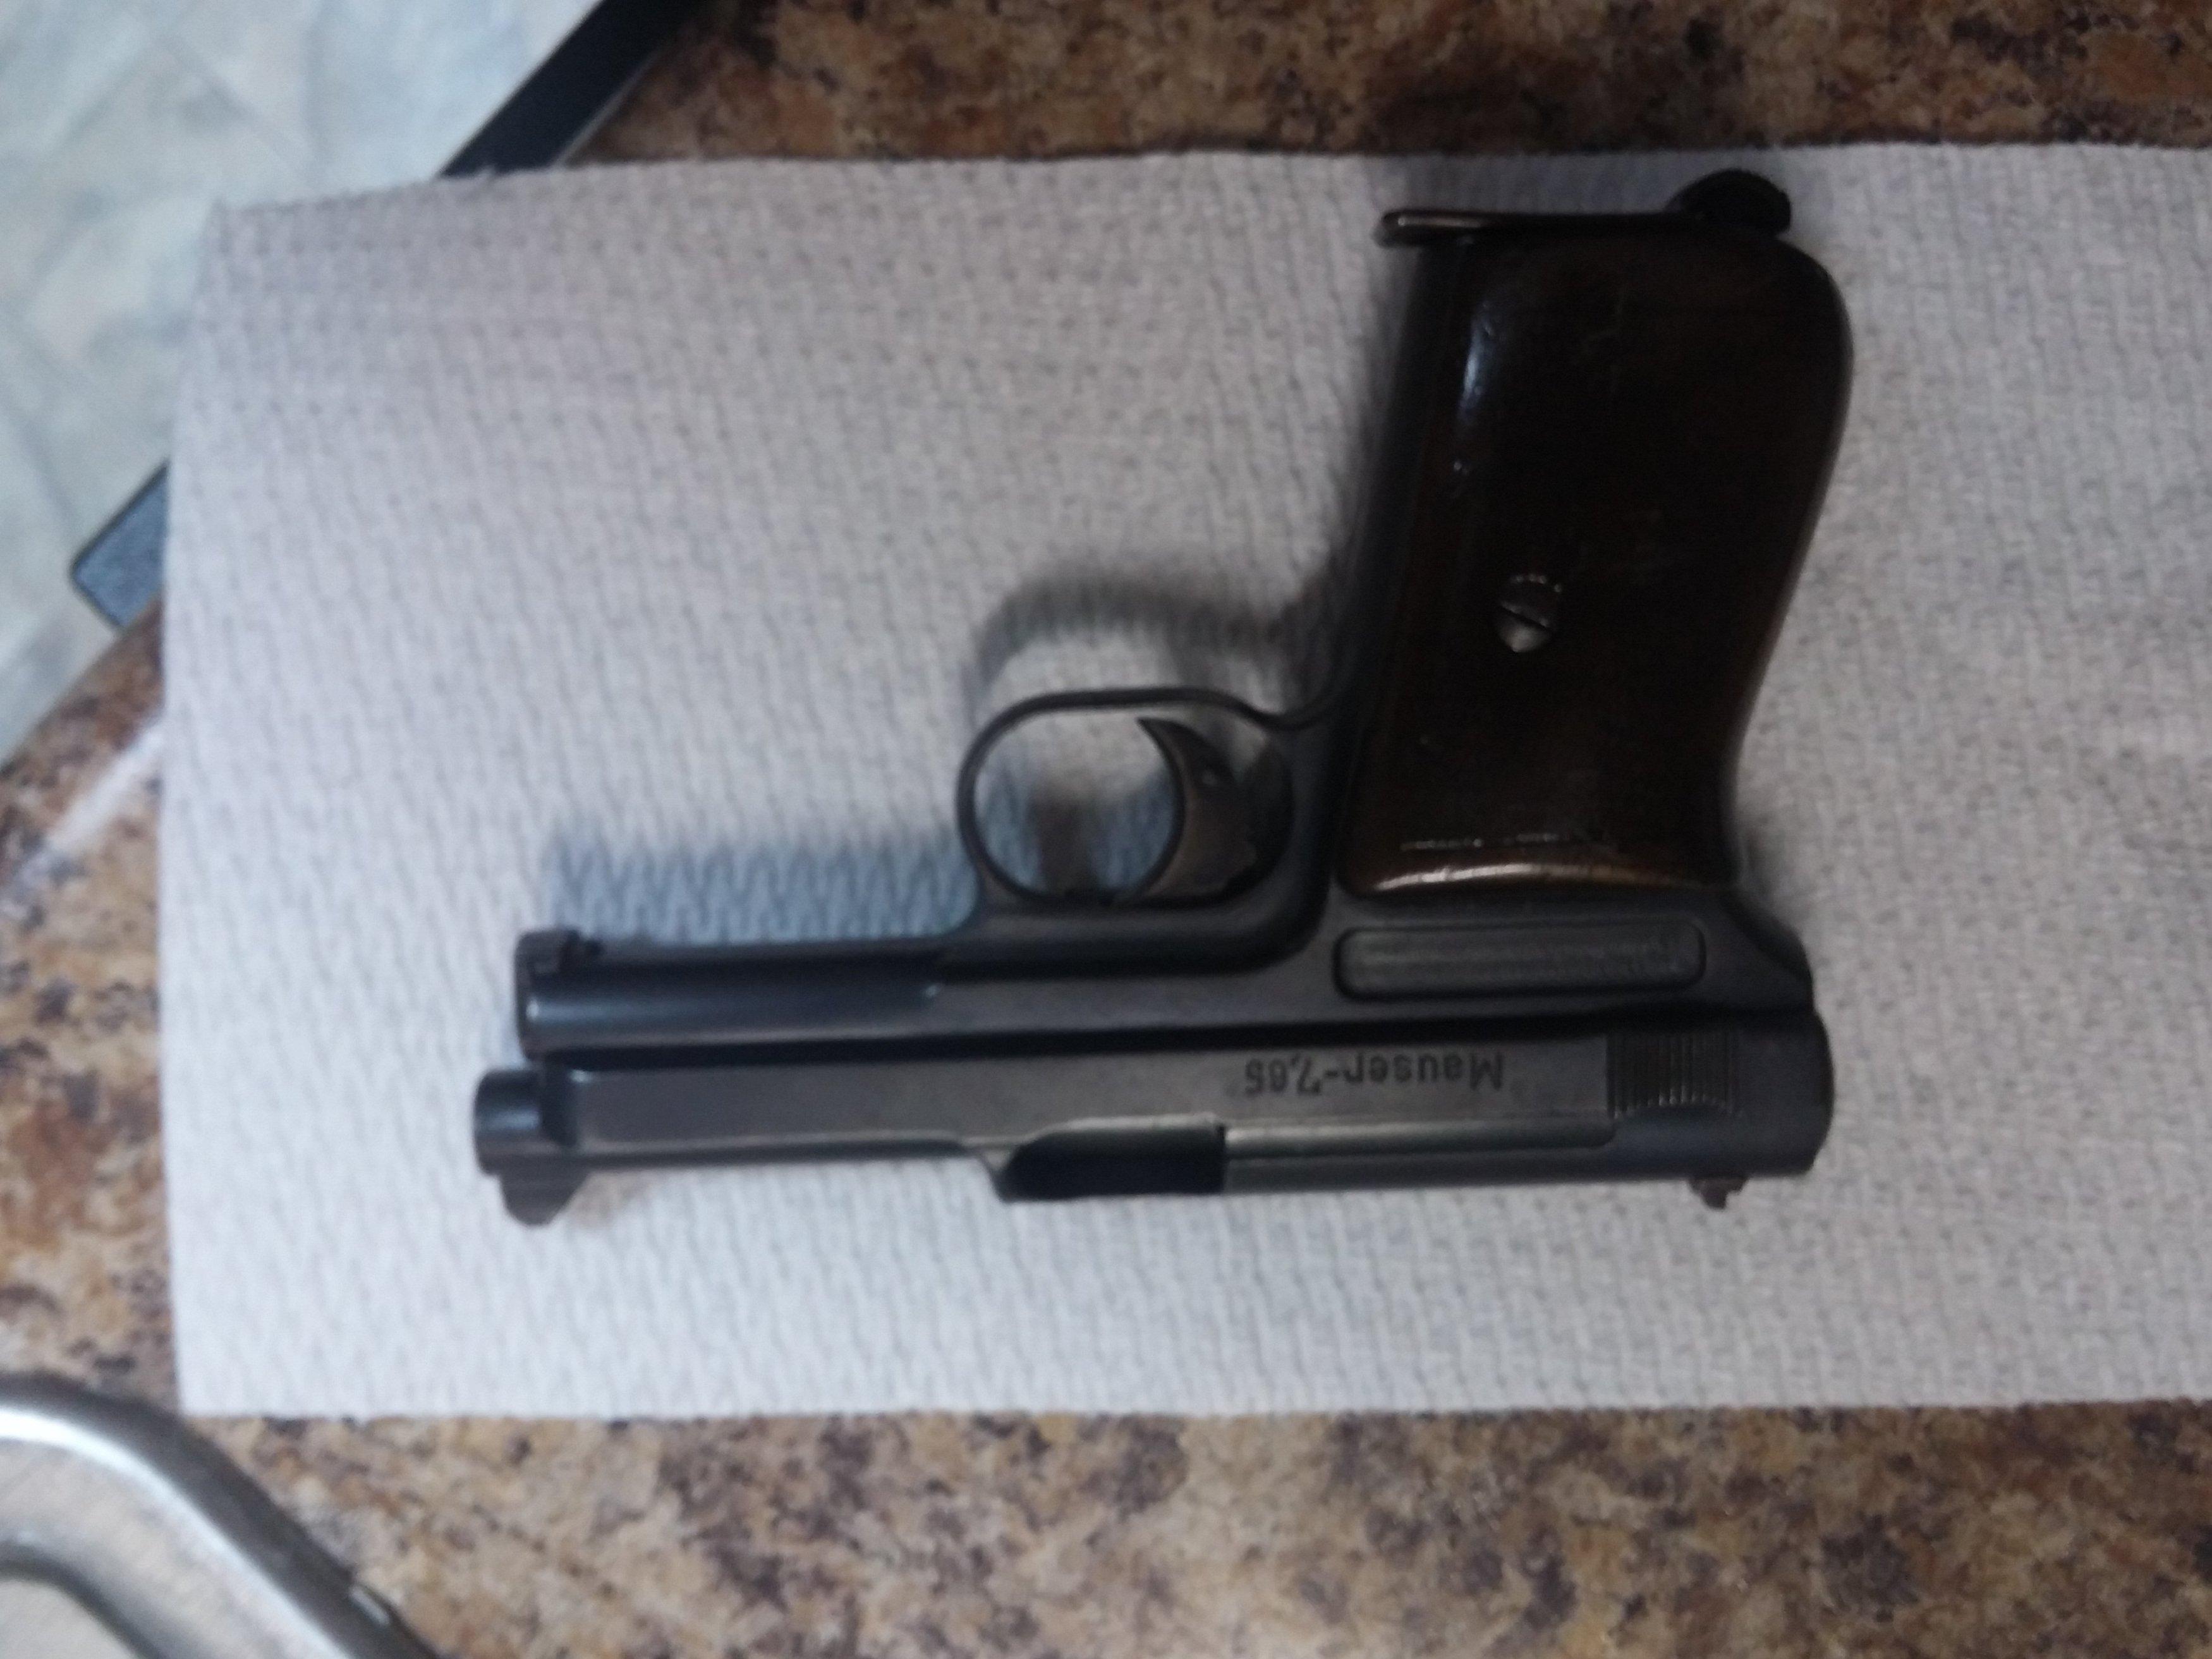 WTS/WTT Mauser 1914 7 65mm/ 32 ACP Nice original pistol